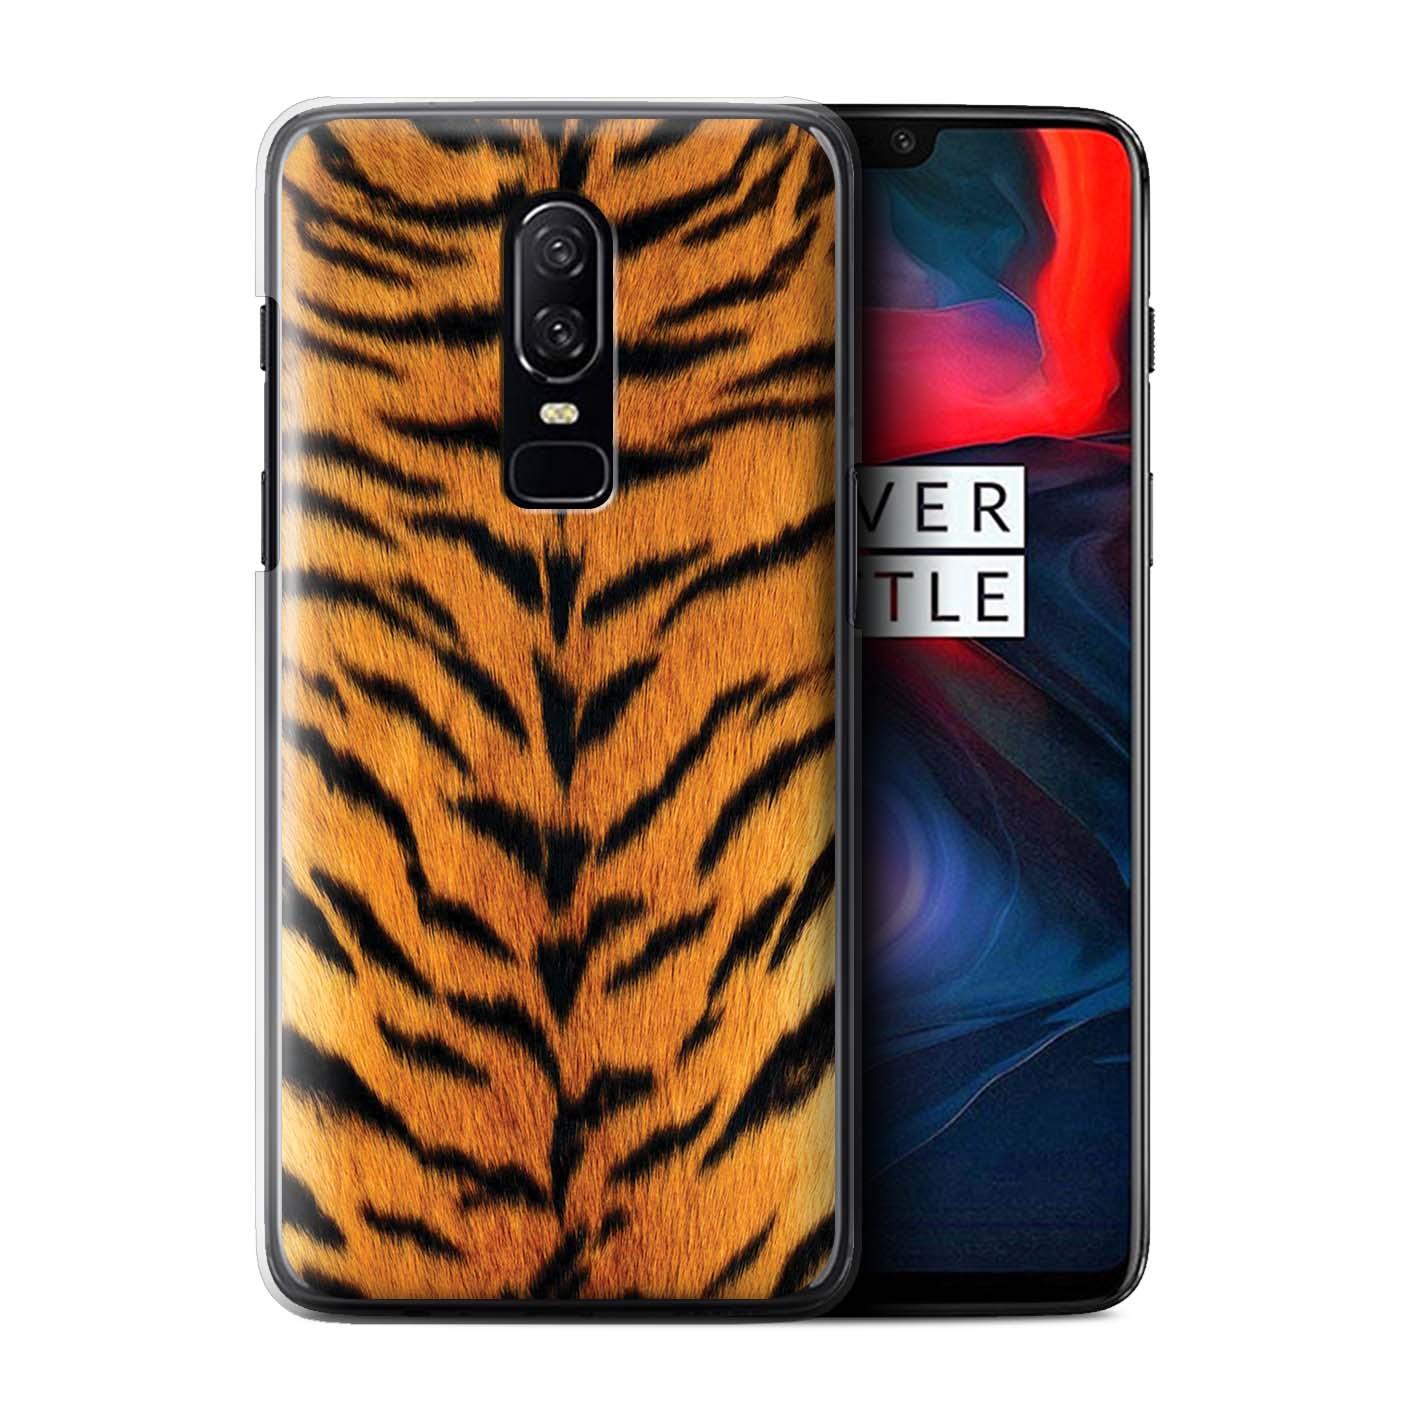 Coque-Etui-Housse-de-Stuff4-pour-OnePlus-6-Tigre-animale-Peau-Motif